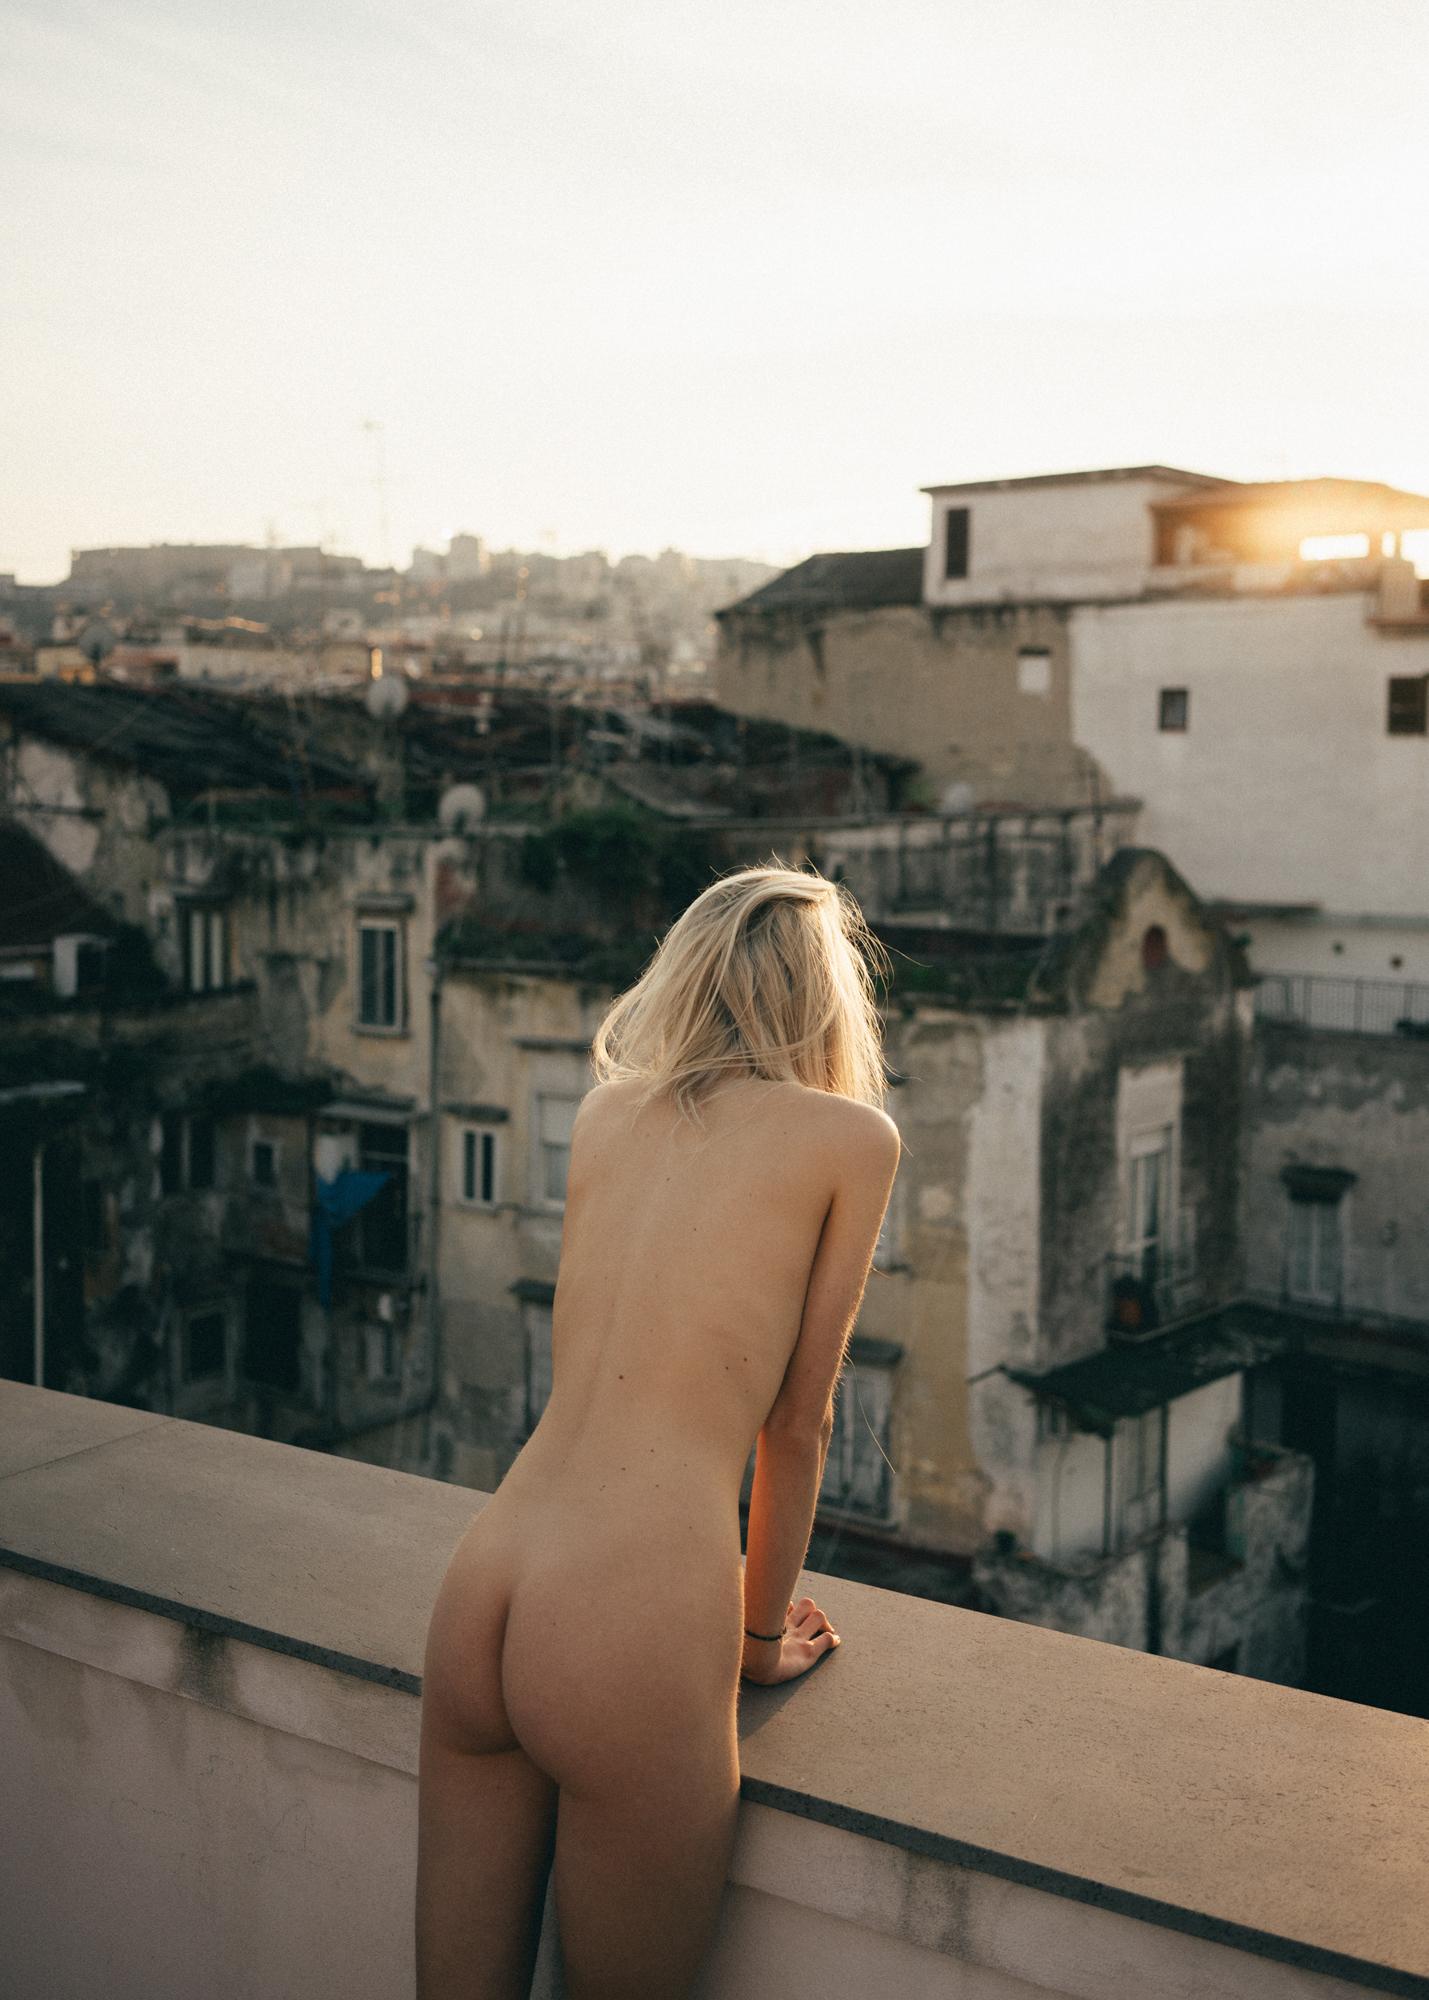 Sarah_Friedeberg-Alexis_White-Feetrica-01.jpg